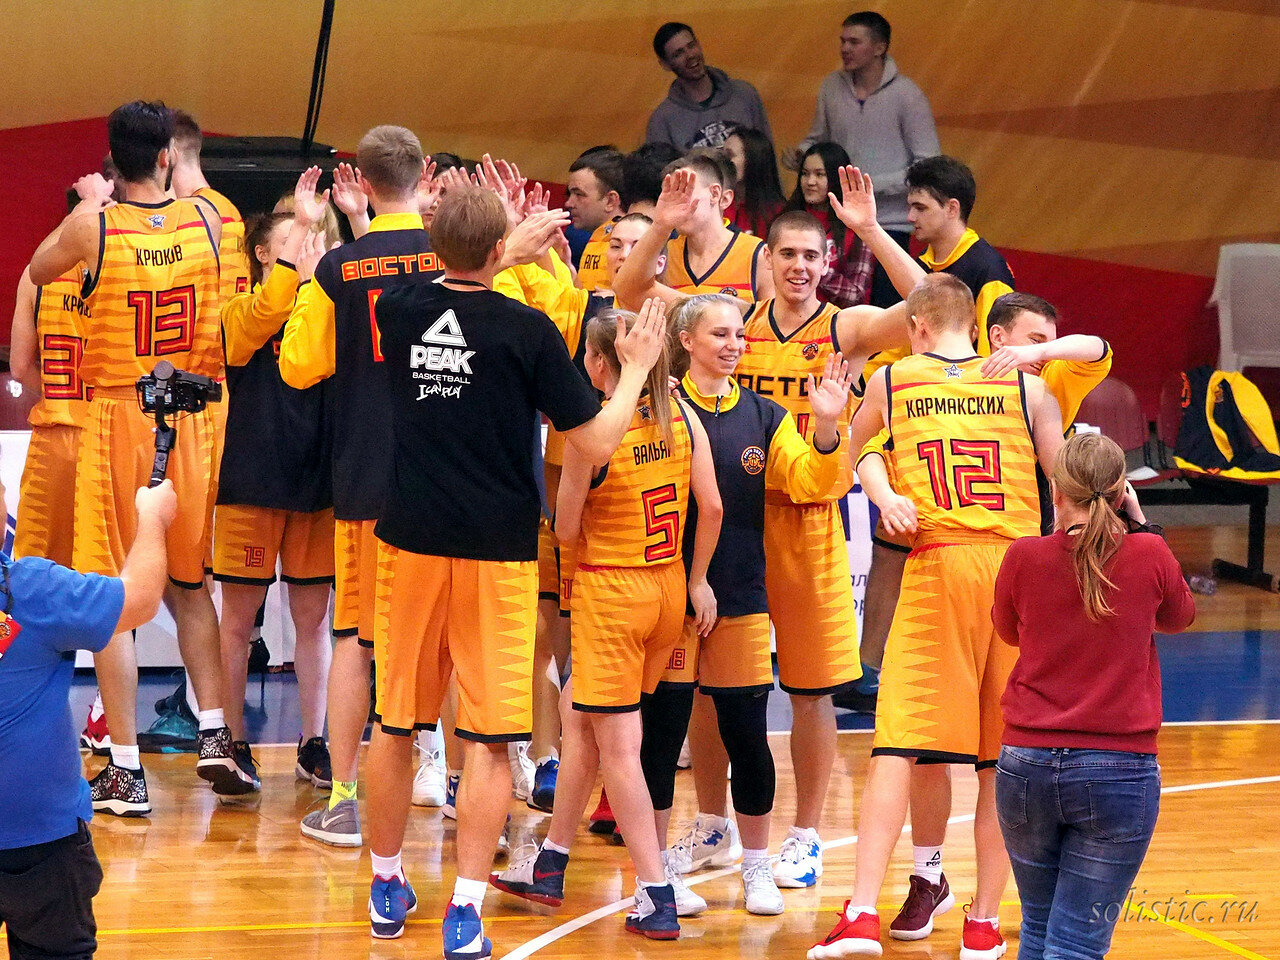 147 Матч звезд АСБ 2018 (ассоциации студенческого баскетбола)